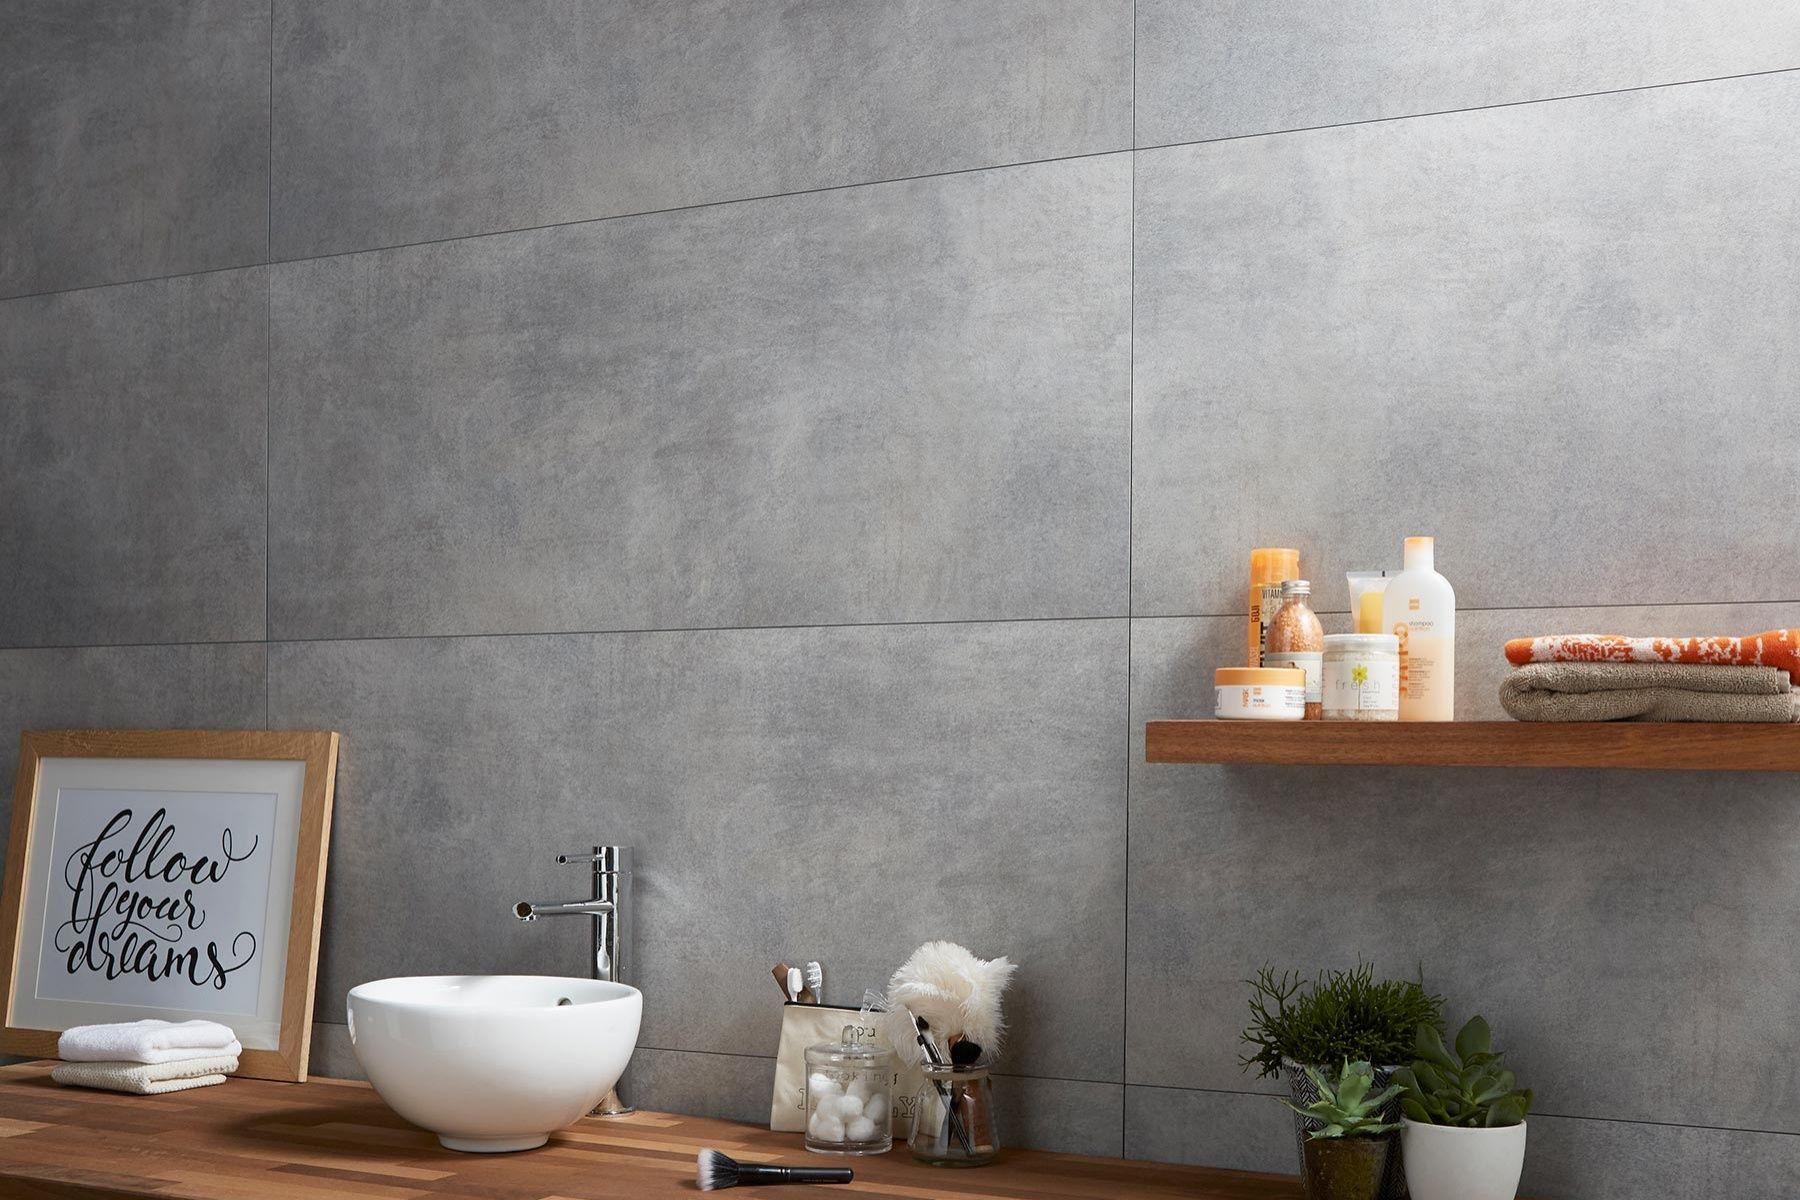 Dumawall Bathroom Cladding Pvc Wall Panels Bathroom Wall Tile